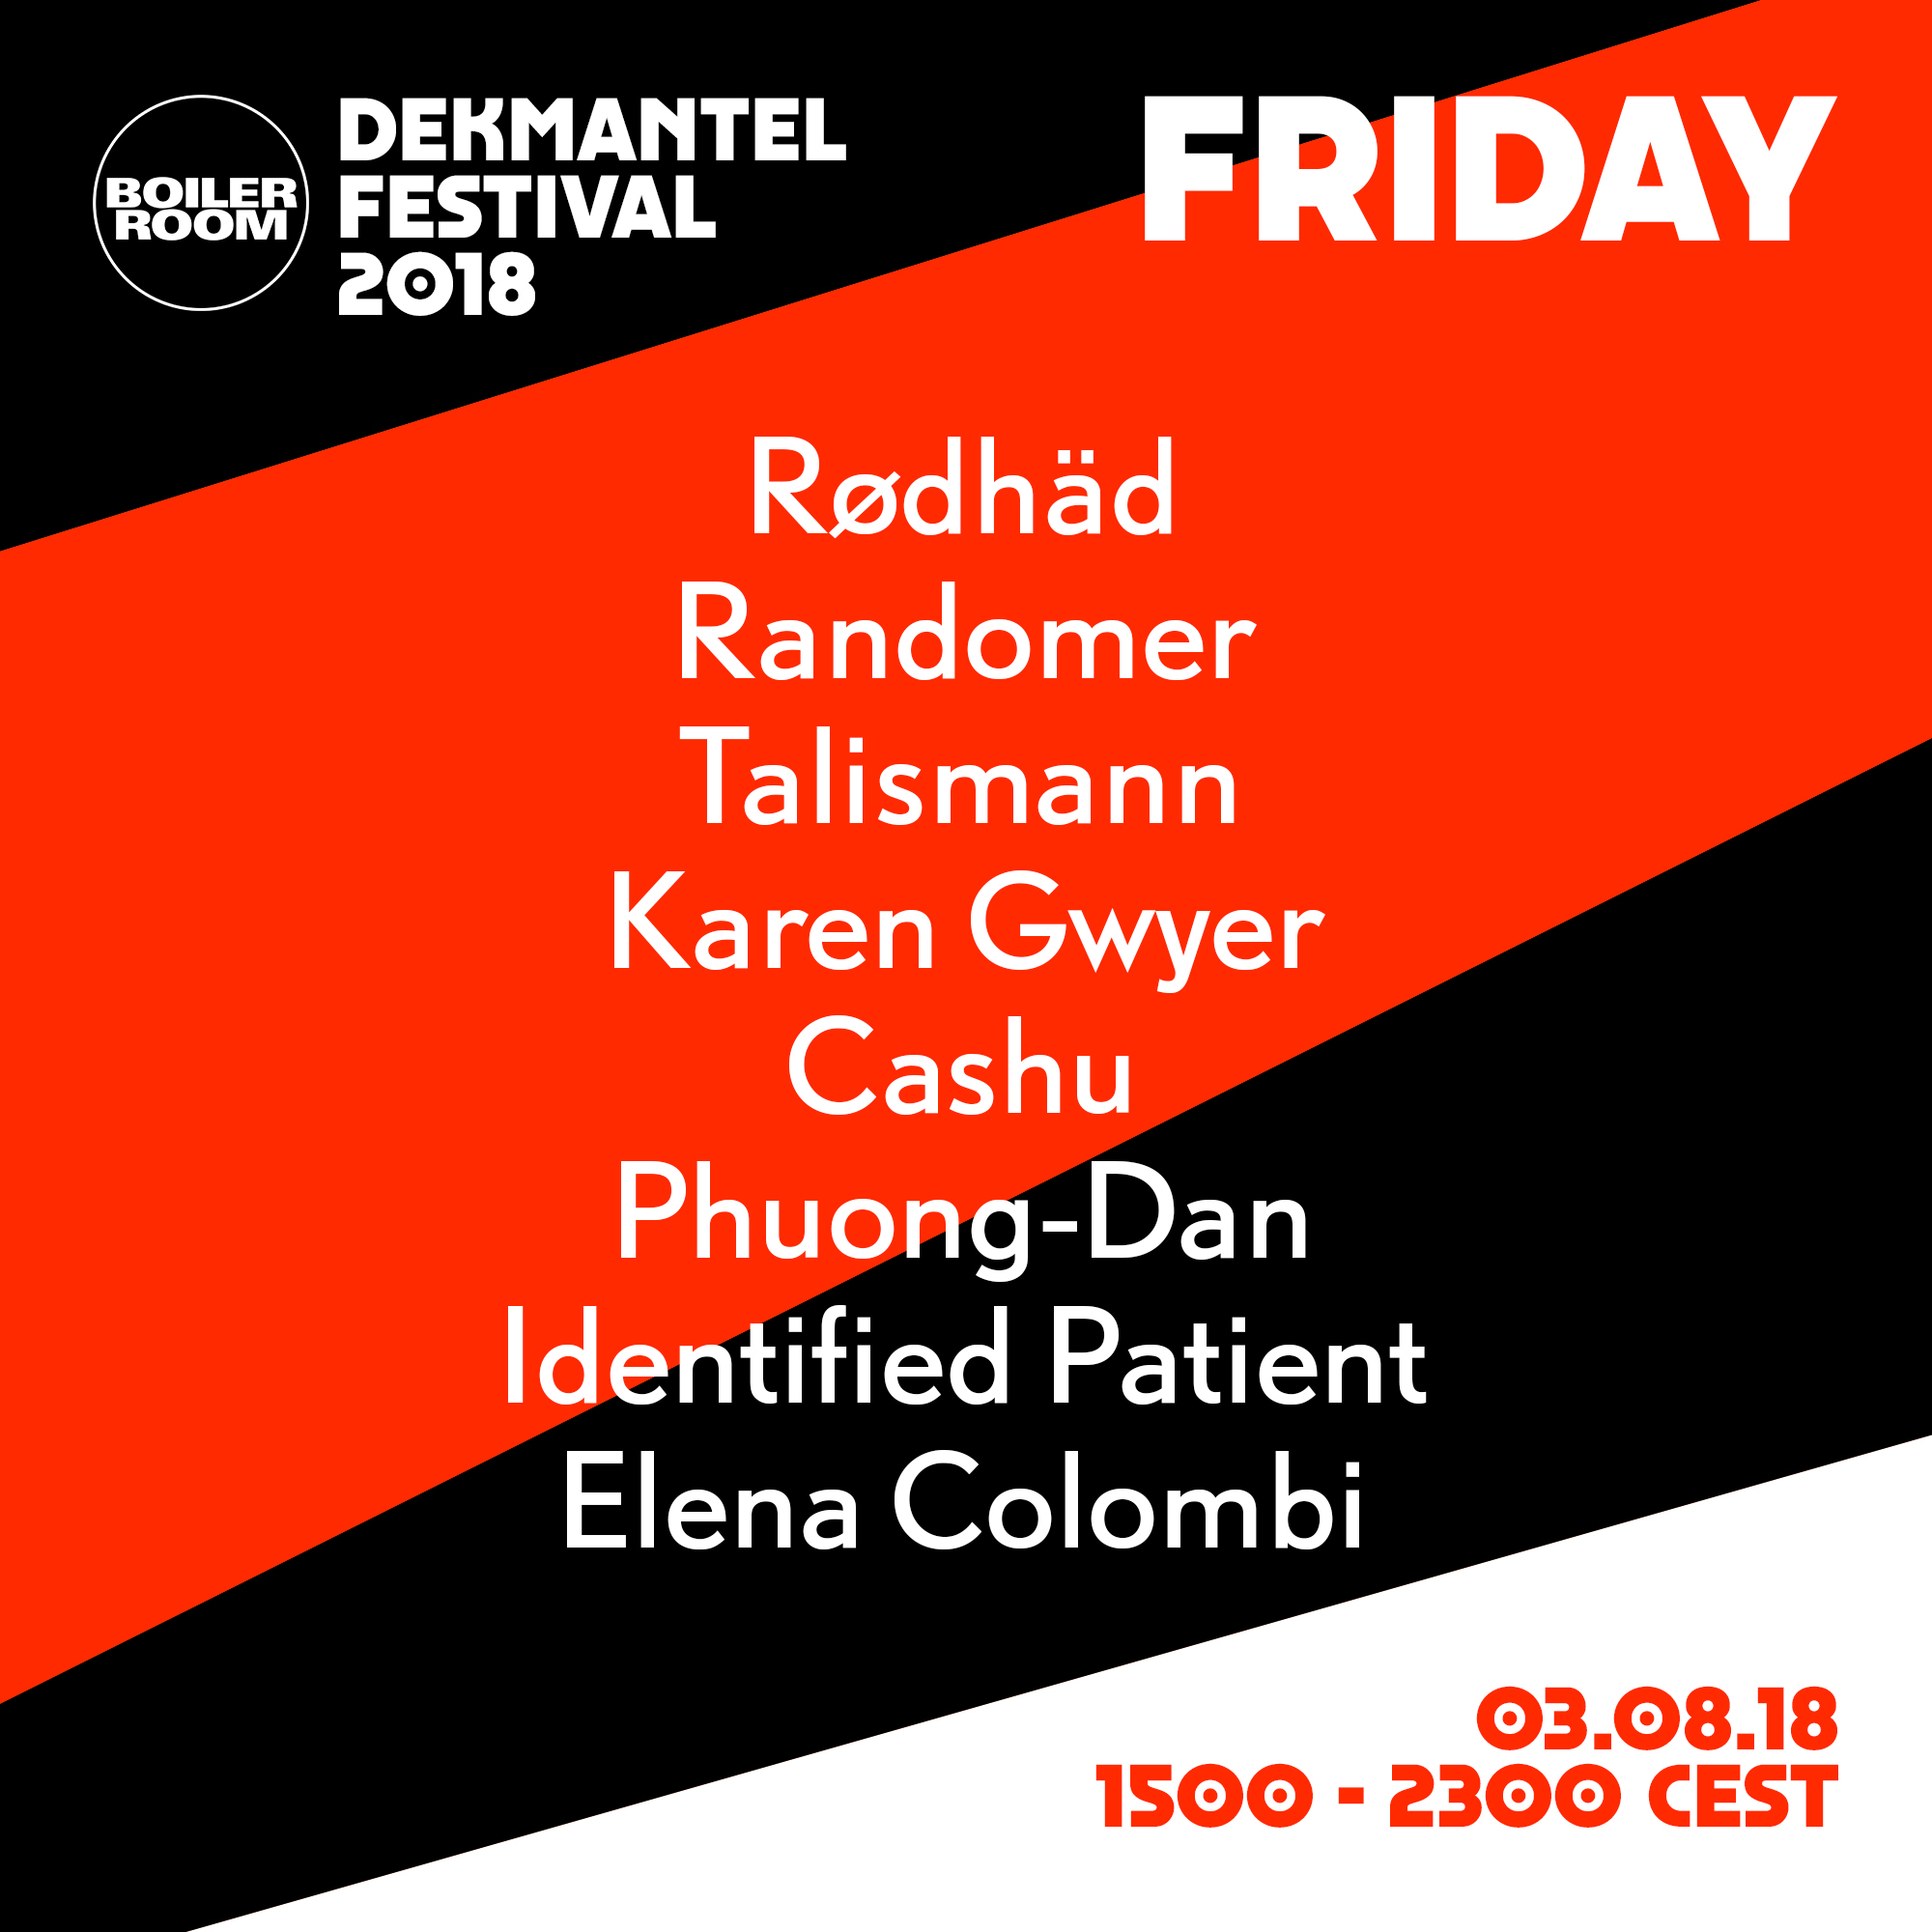 Dekmantel 2018 Friday Flyer Image